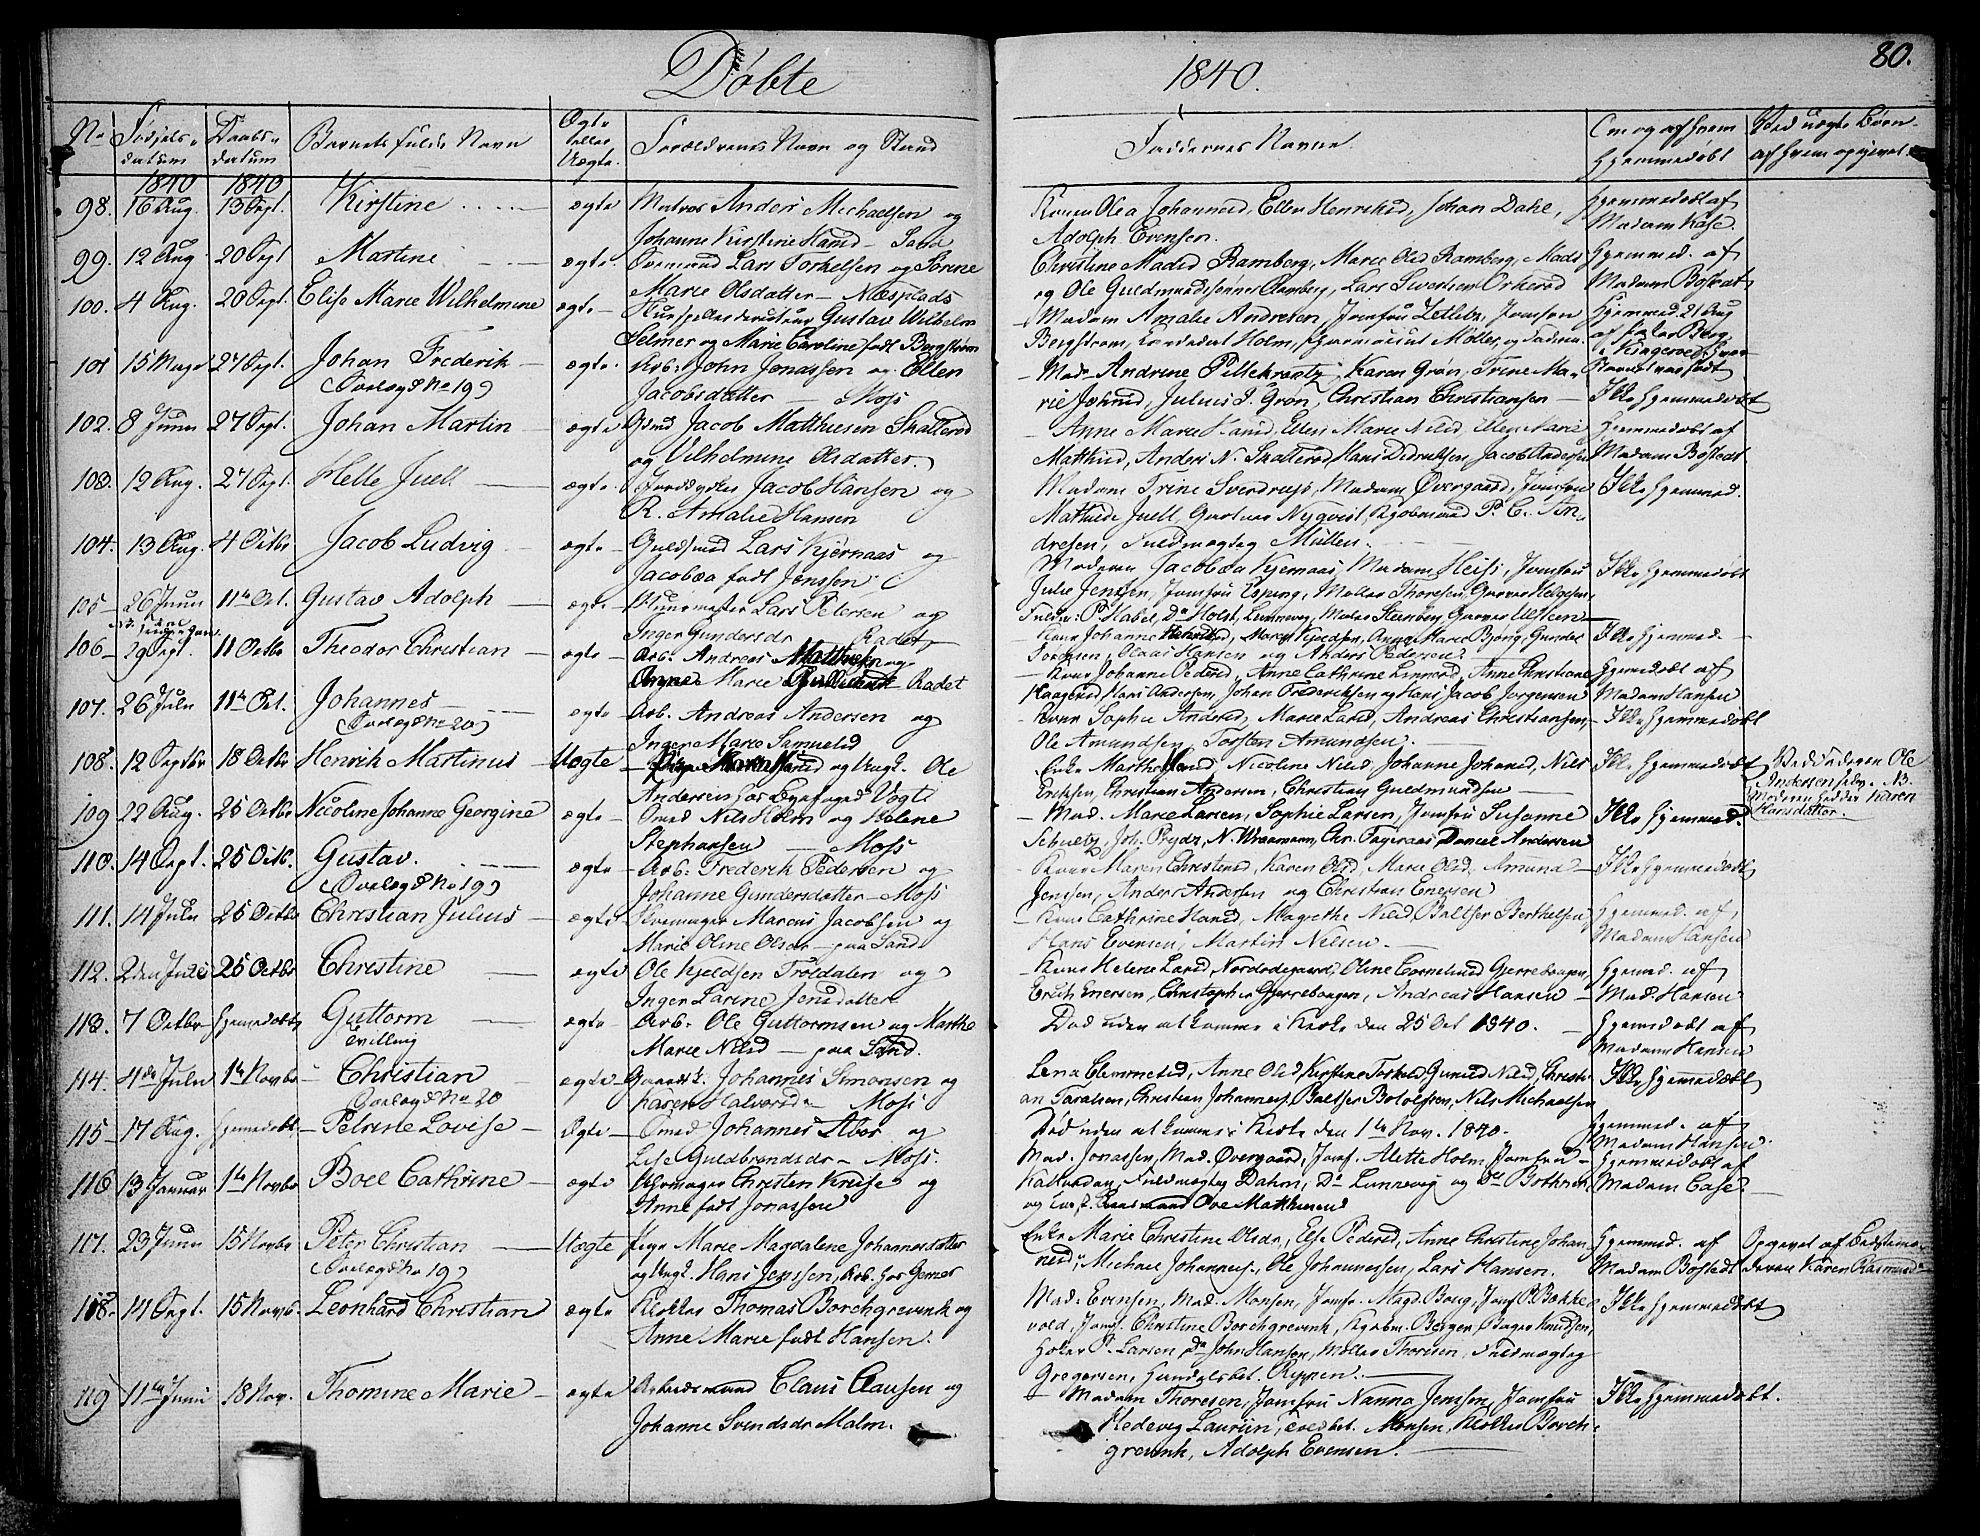 SAO, Moss prestekontor Kirkebøker, F/Fa/Faa/L0006: Ministerialbok nr. I 6, 1829-1844, s. 80